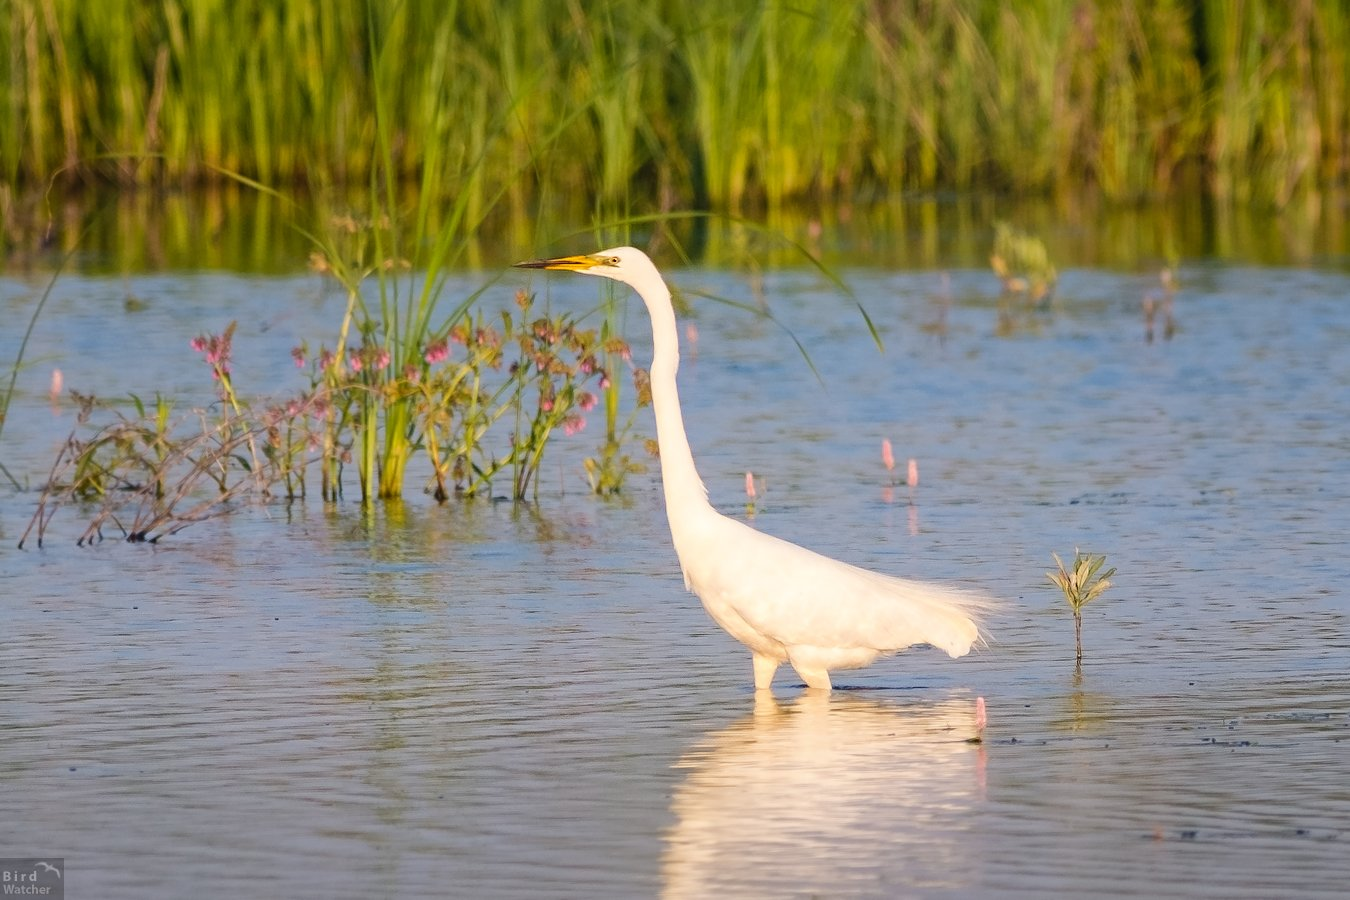 Ardea alba, bird, birds, nature, болото, лето, природа, птицы, белая цапля, birdwatcher, Great egret, Bird Watcher